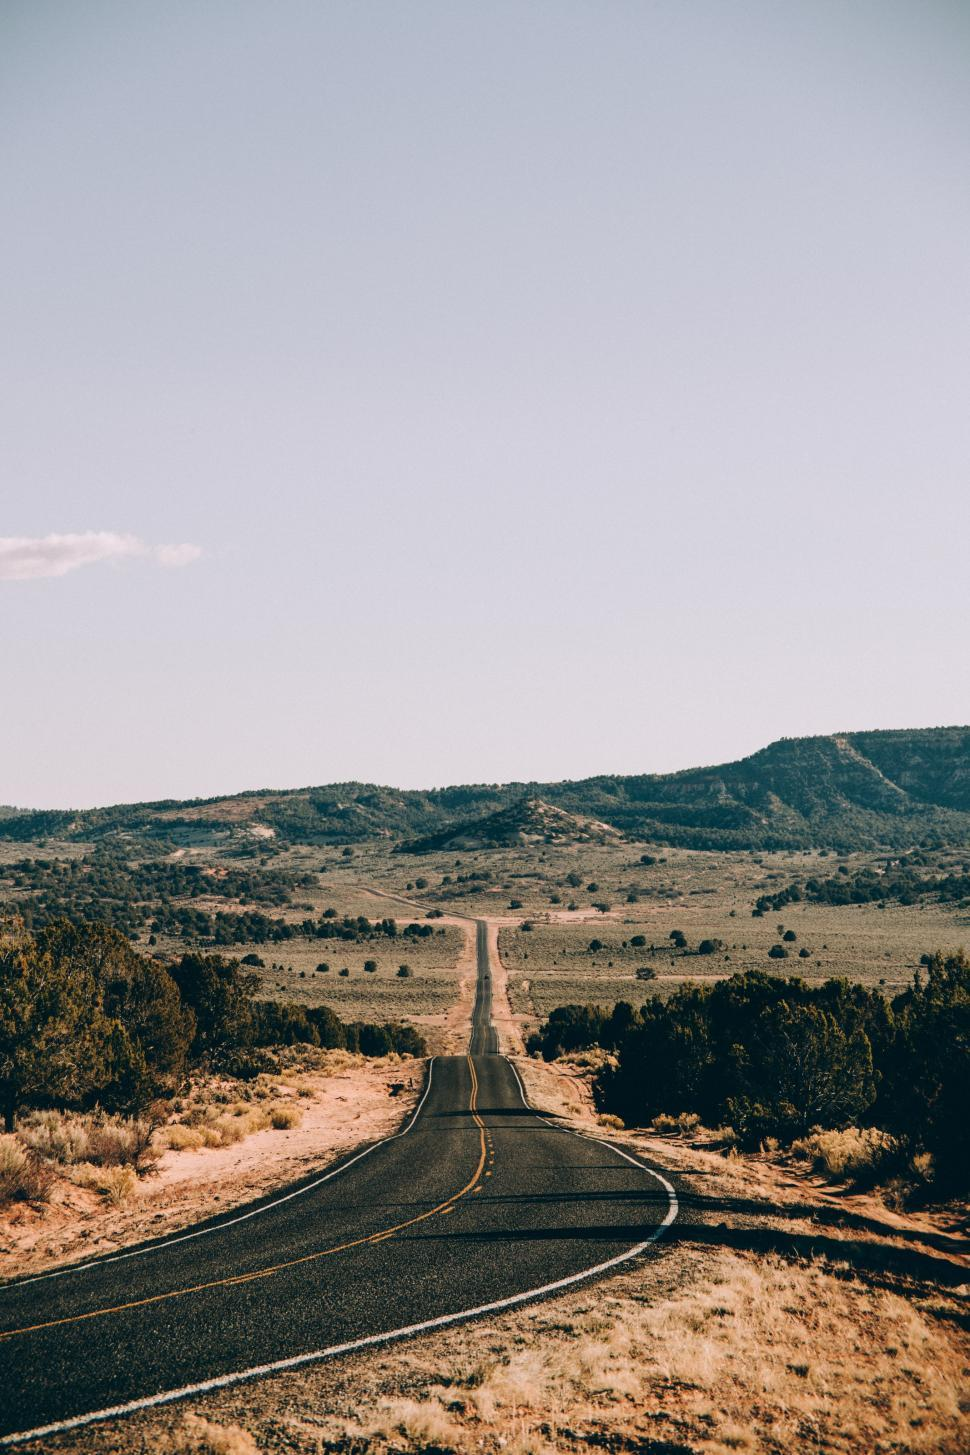 Download Free Stock HD Photo of Long highway in Arizona desert Online